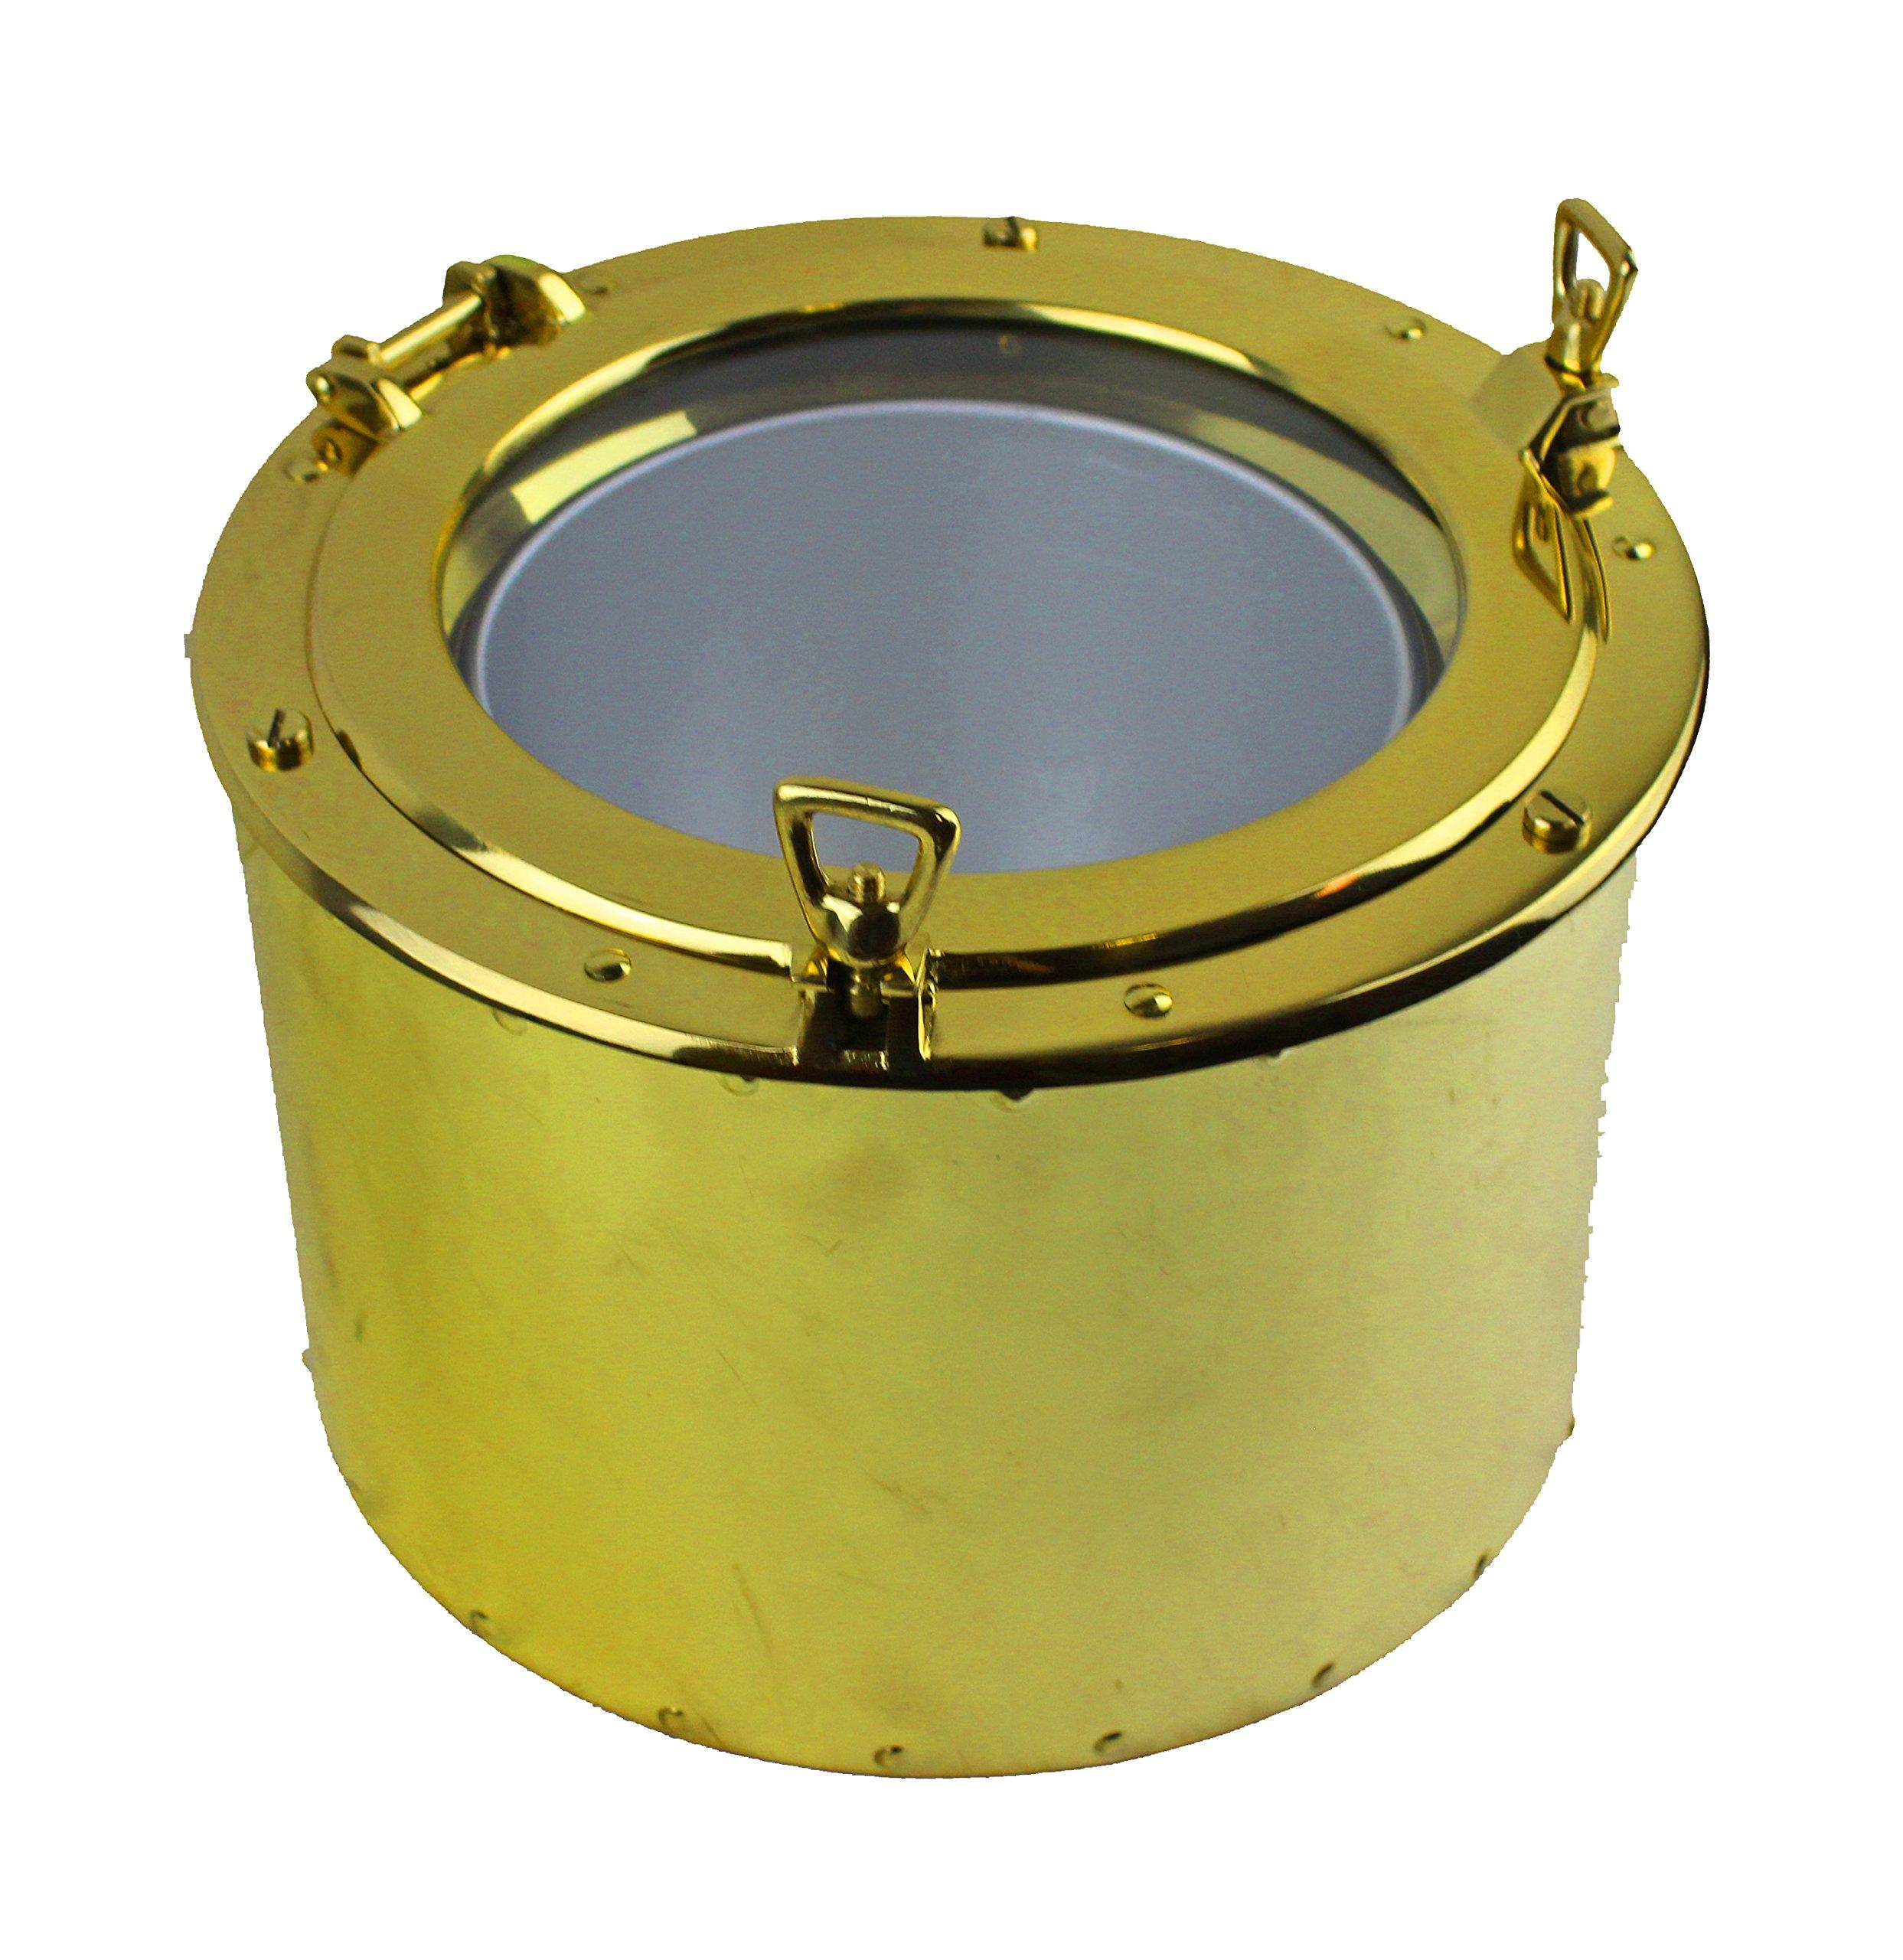 11.5''Dia Solid Brass Porthole Ice Bucket